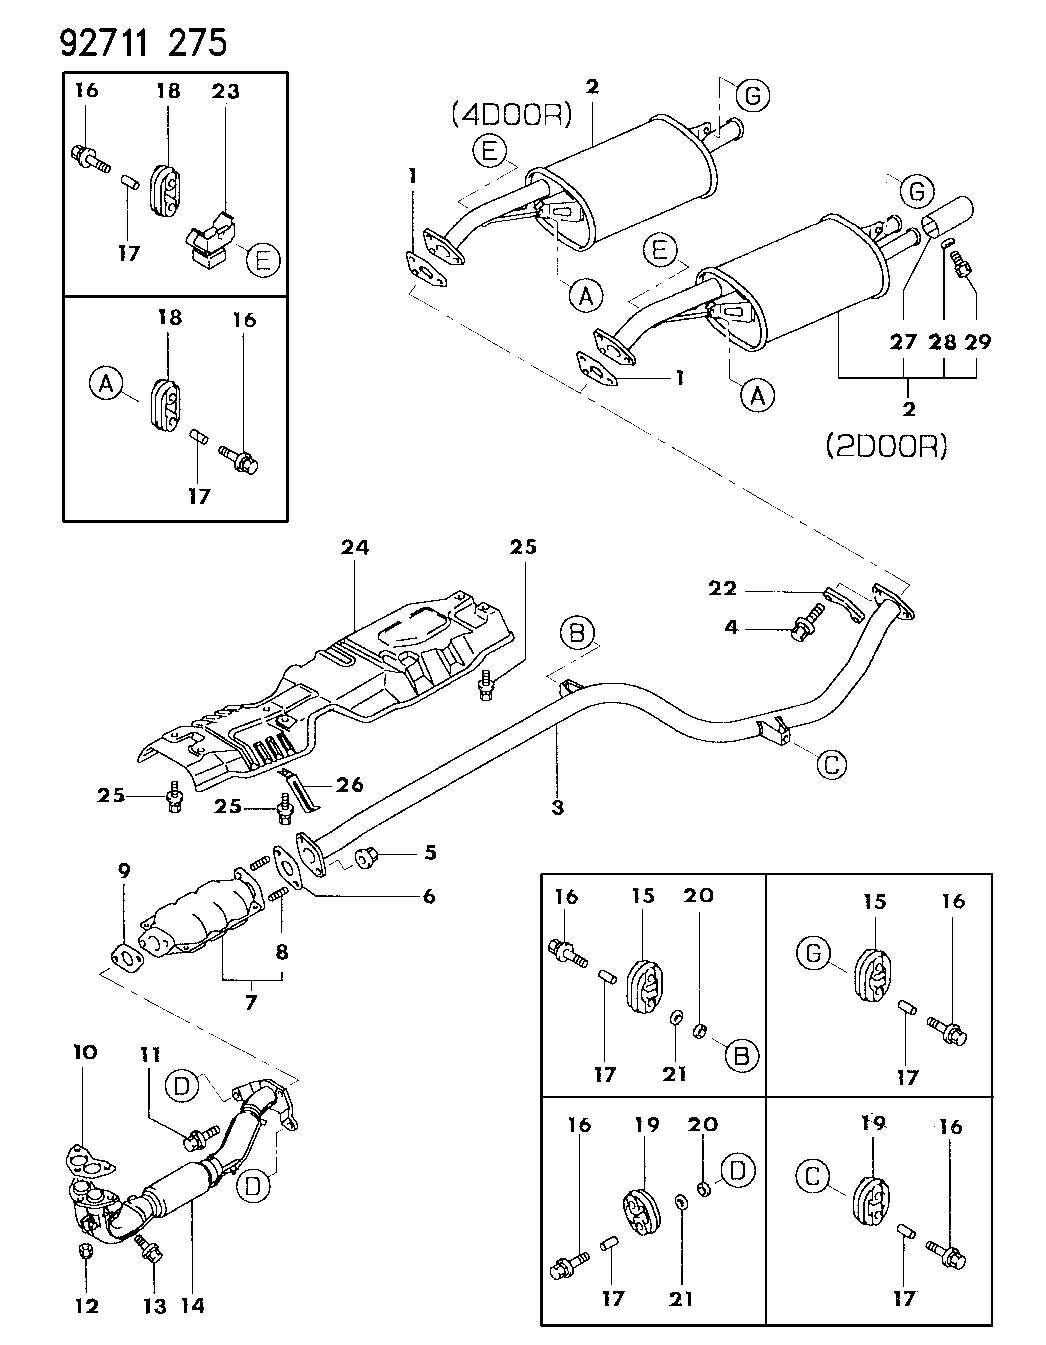 Mb687021